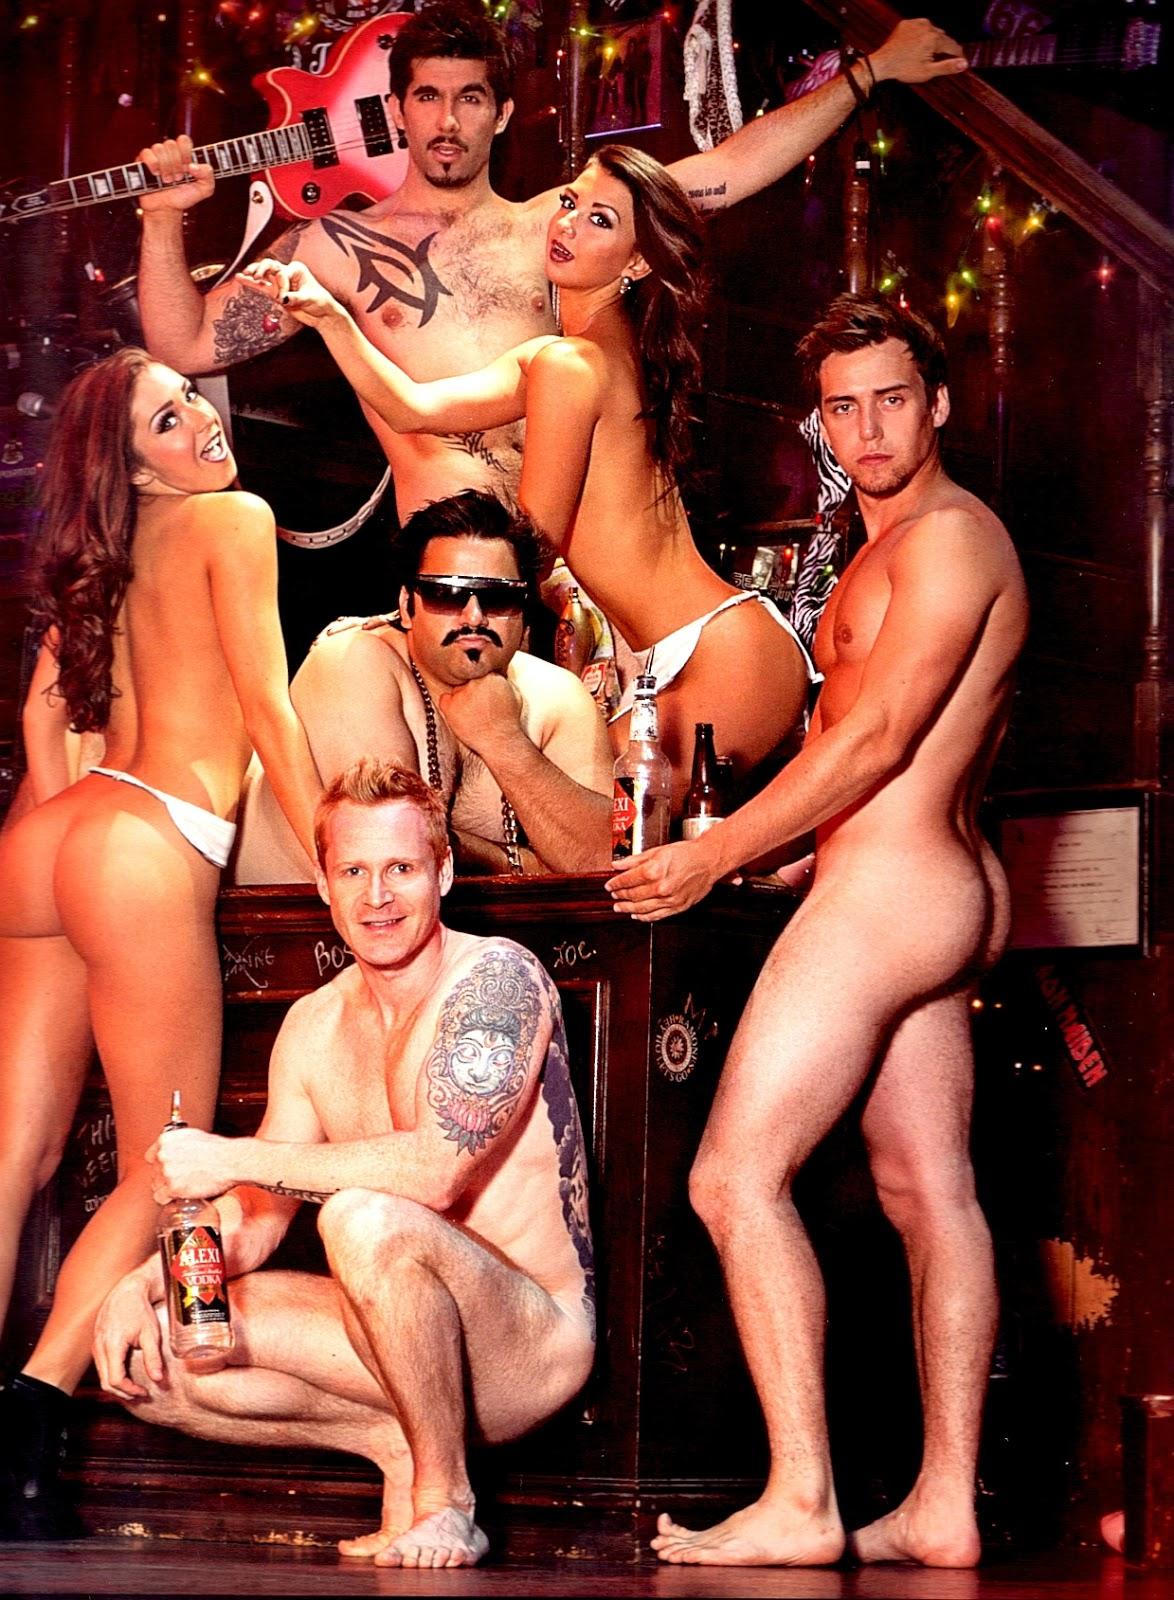 Nude rockstars